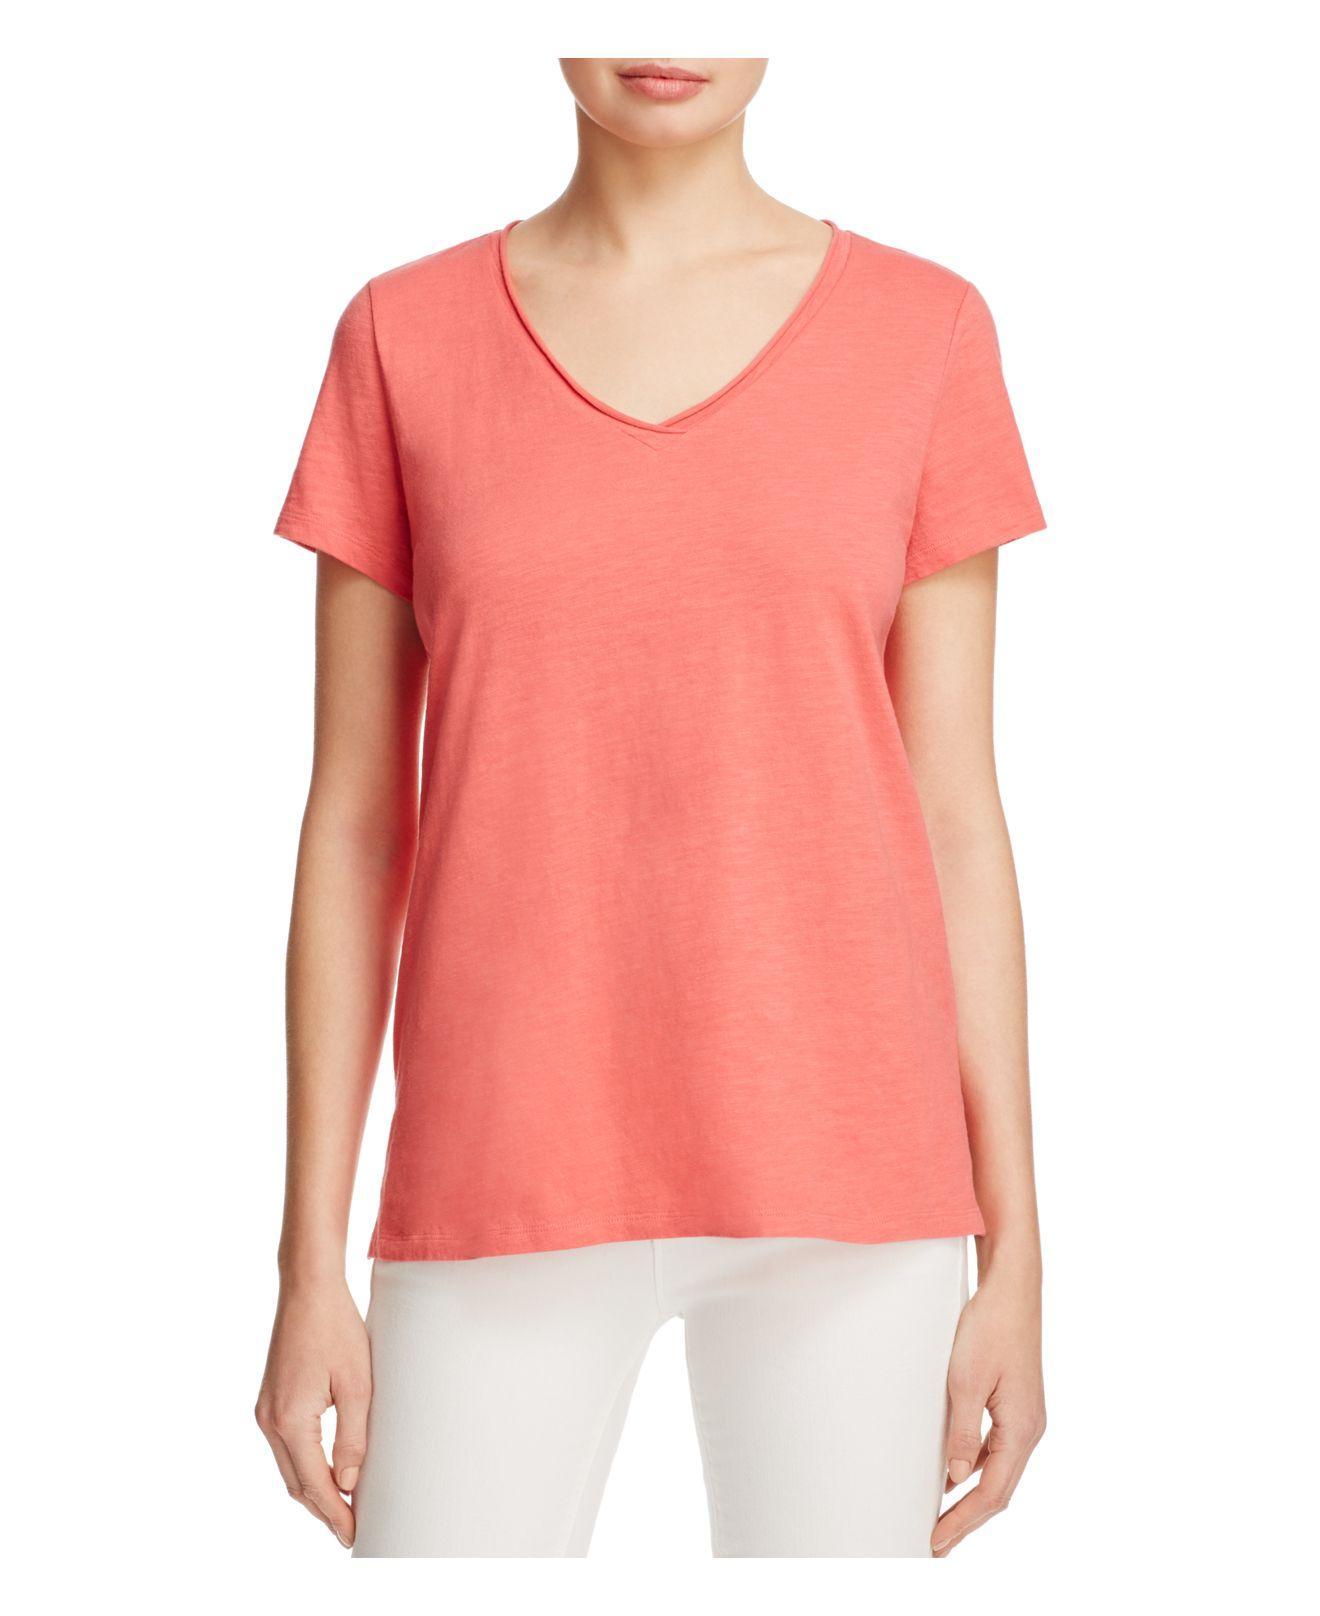 Lyst eileen fisher organic cotton v neck tee in pink for Eileen fisher organic cotton t shirt